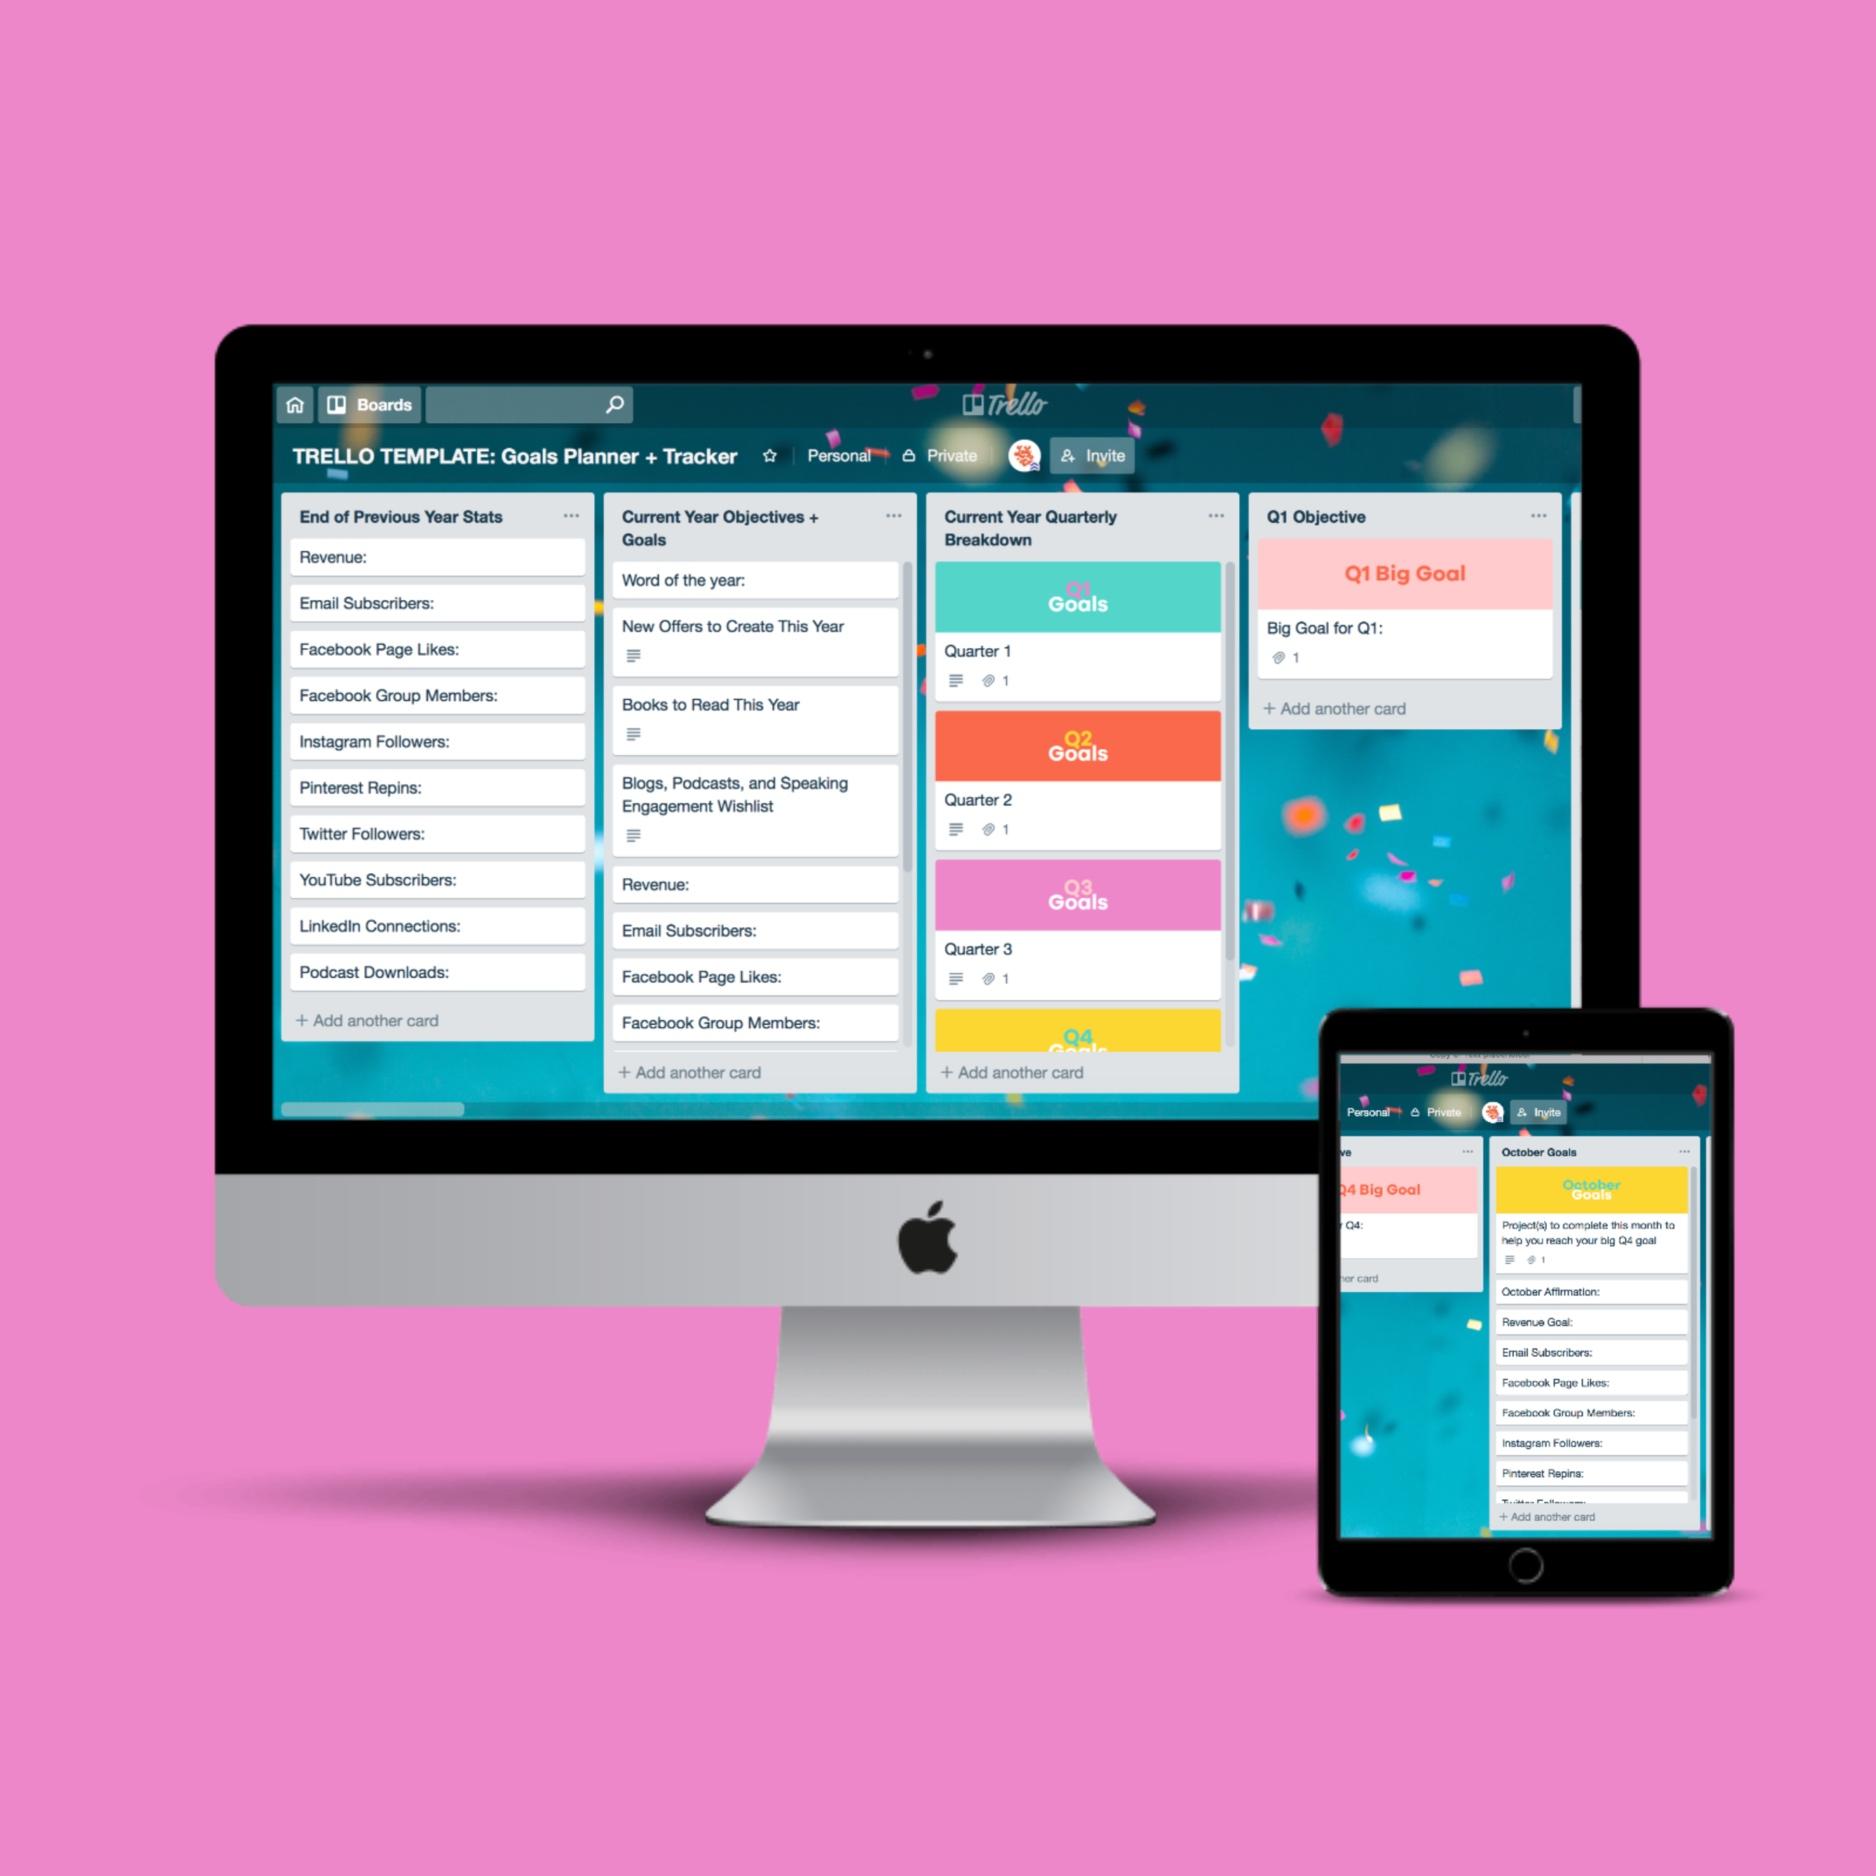 Trello+Board+%7C+Goals+Planner+%2B+Tracker.jpg